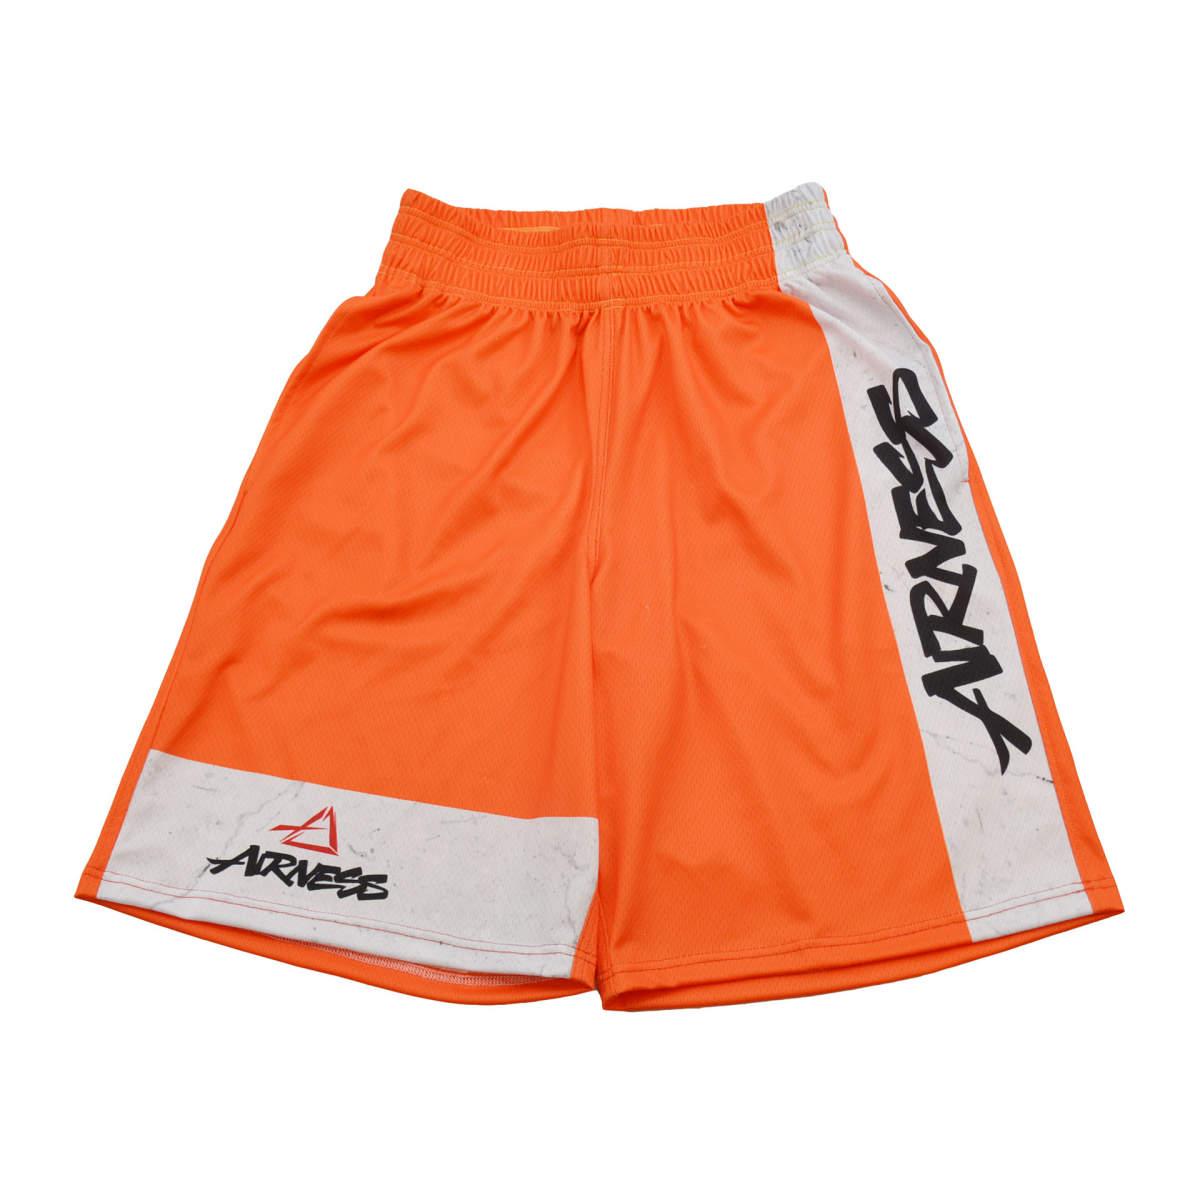 Airness color block short orange